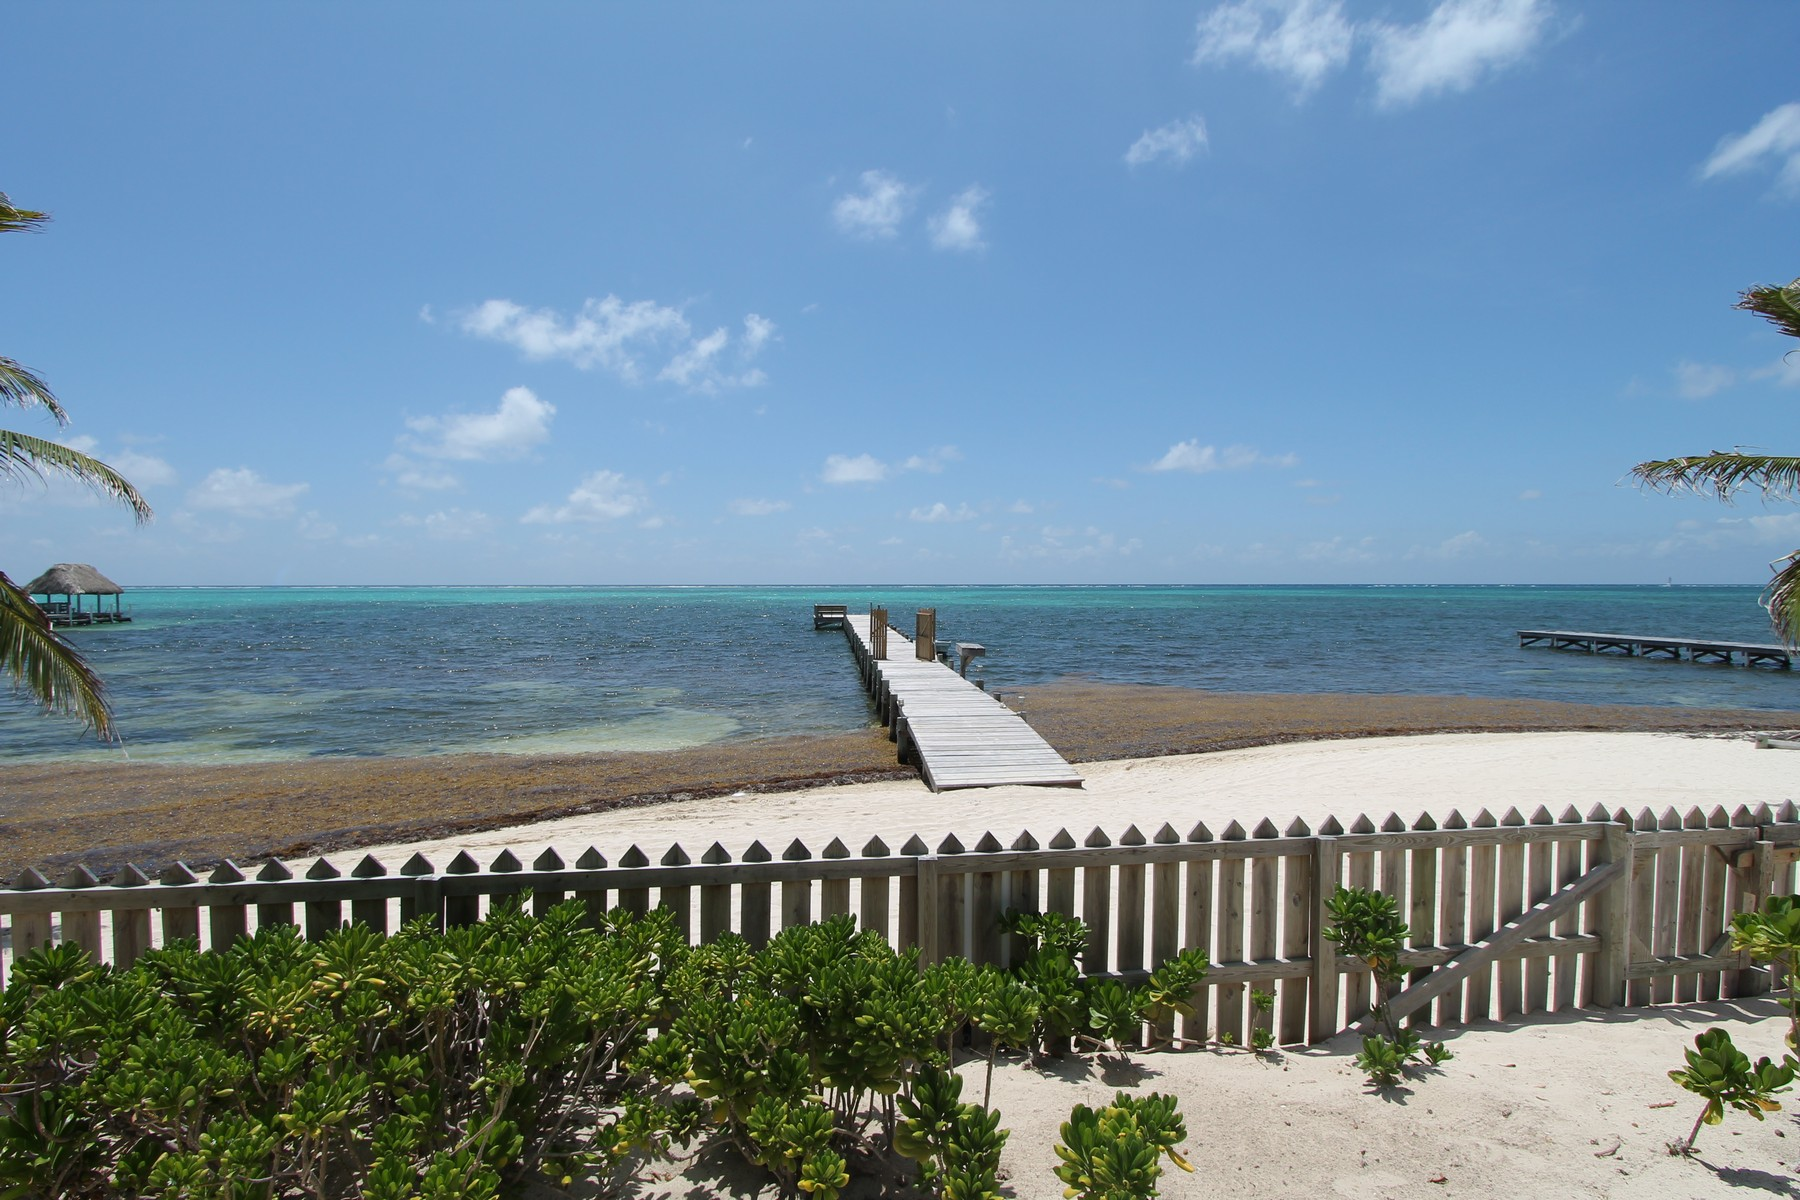 Single Family Home for Rent at Castillo de Arena San Pedro Town, Ambergris Caye Belize